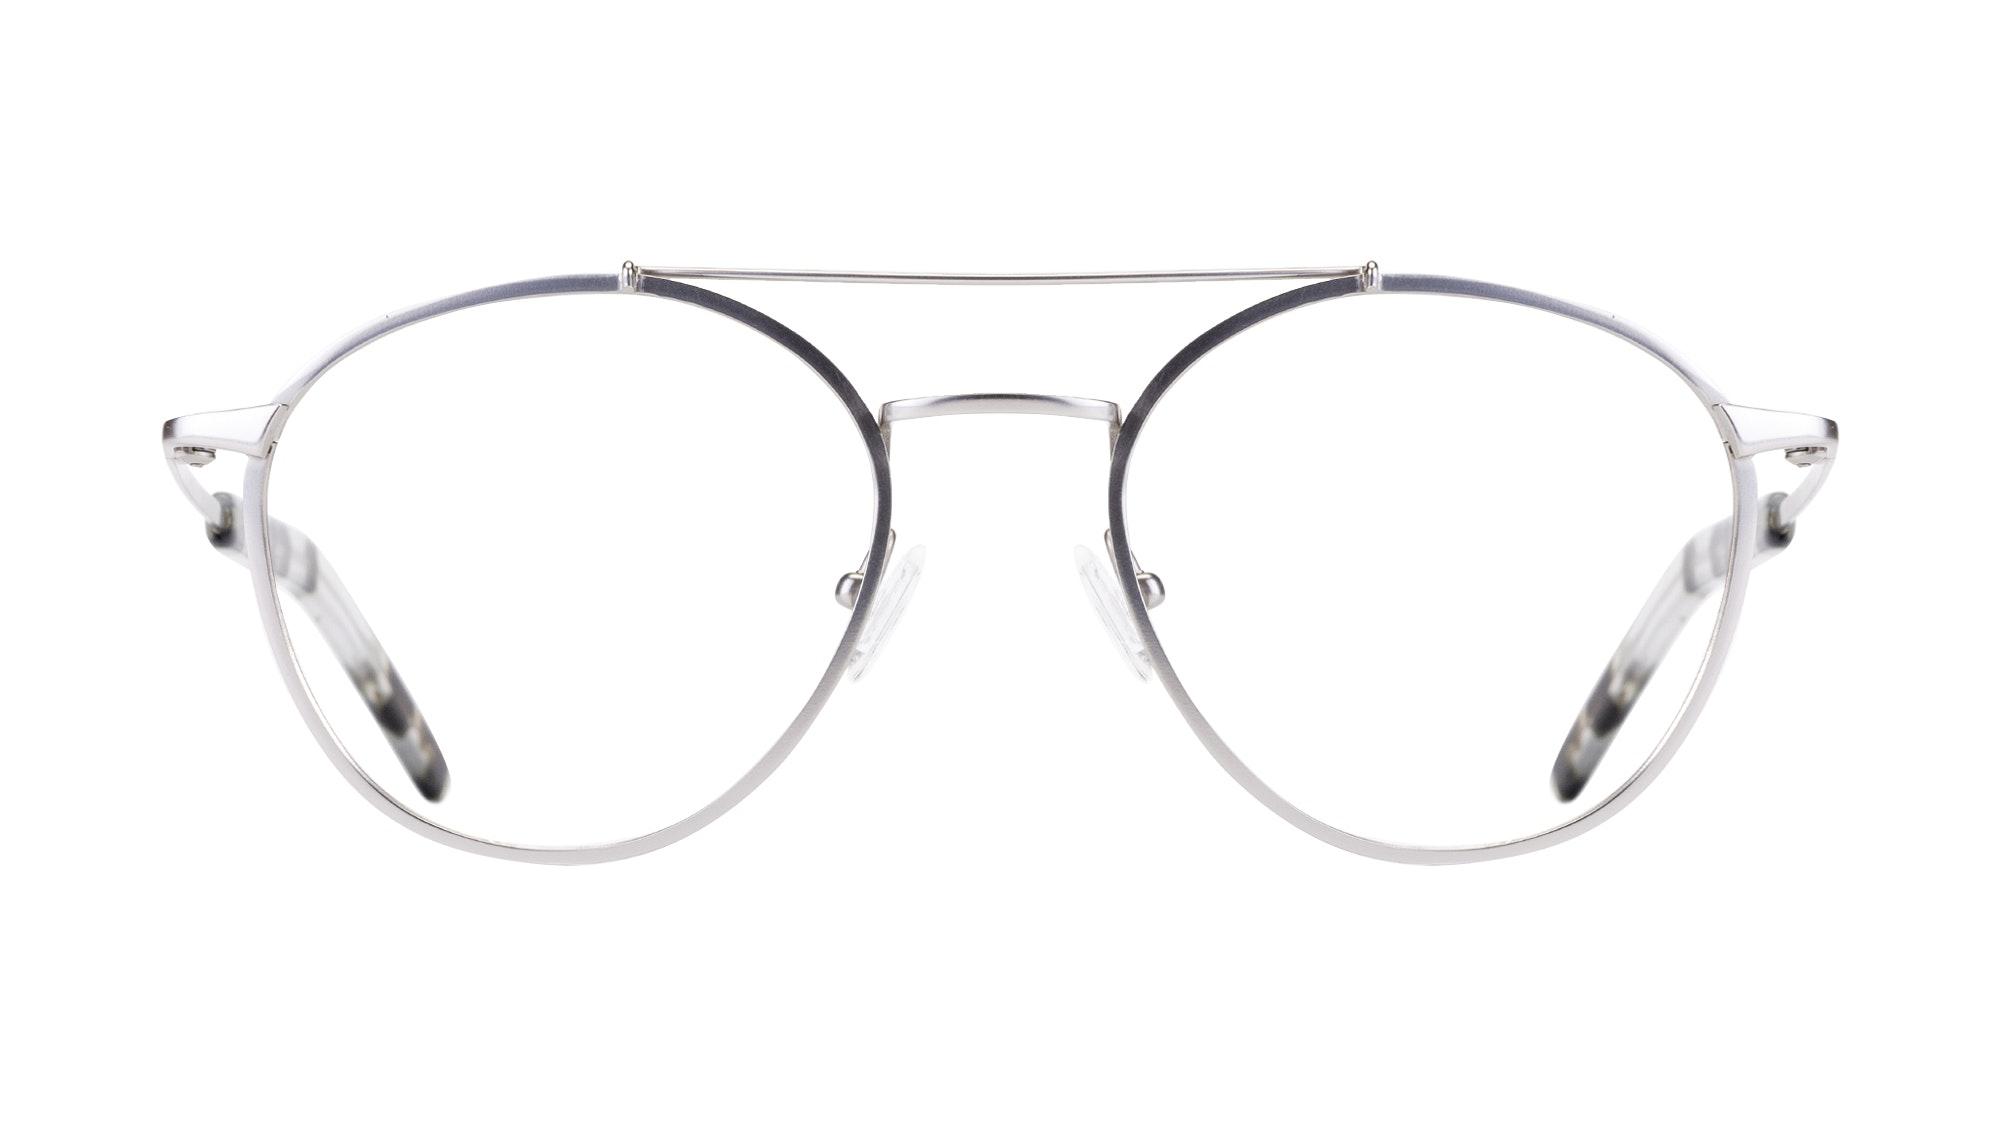 Affordable Fashion Glasses Aviator Eyeglasses Men Gravity Silver